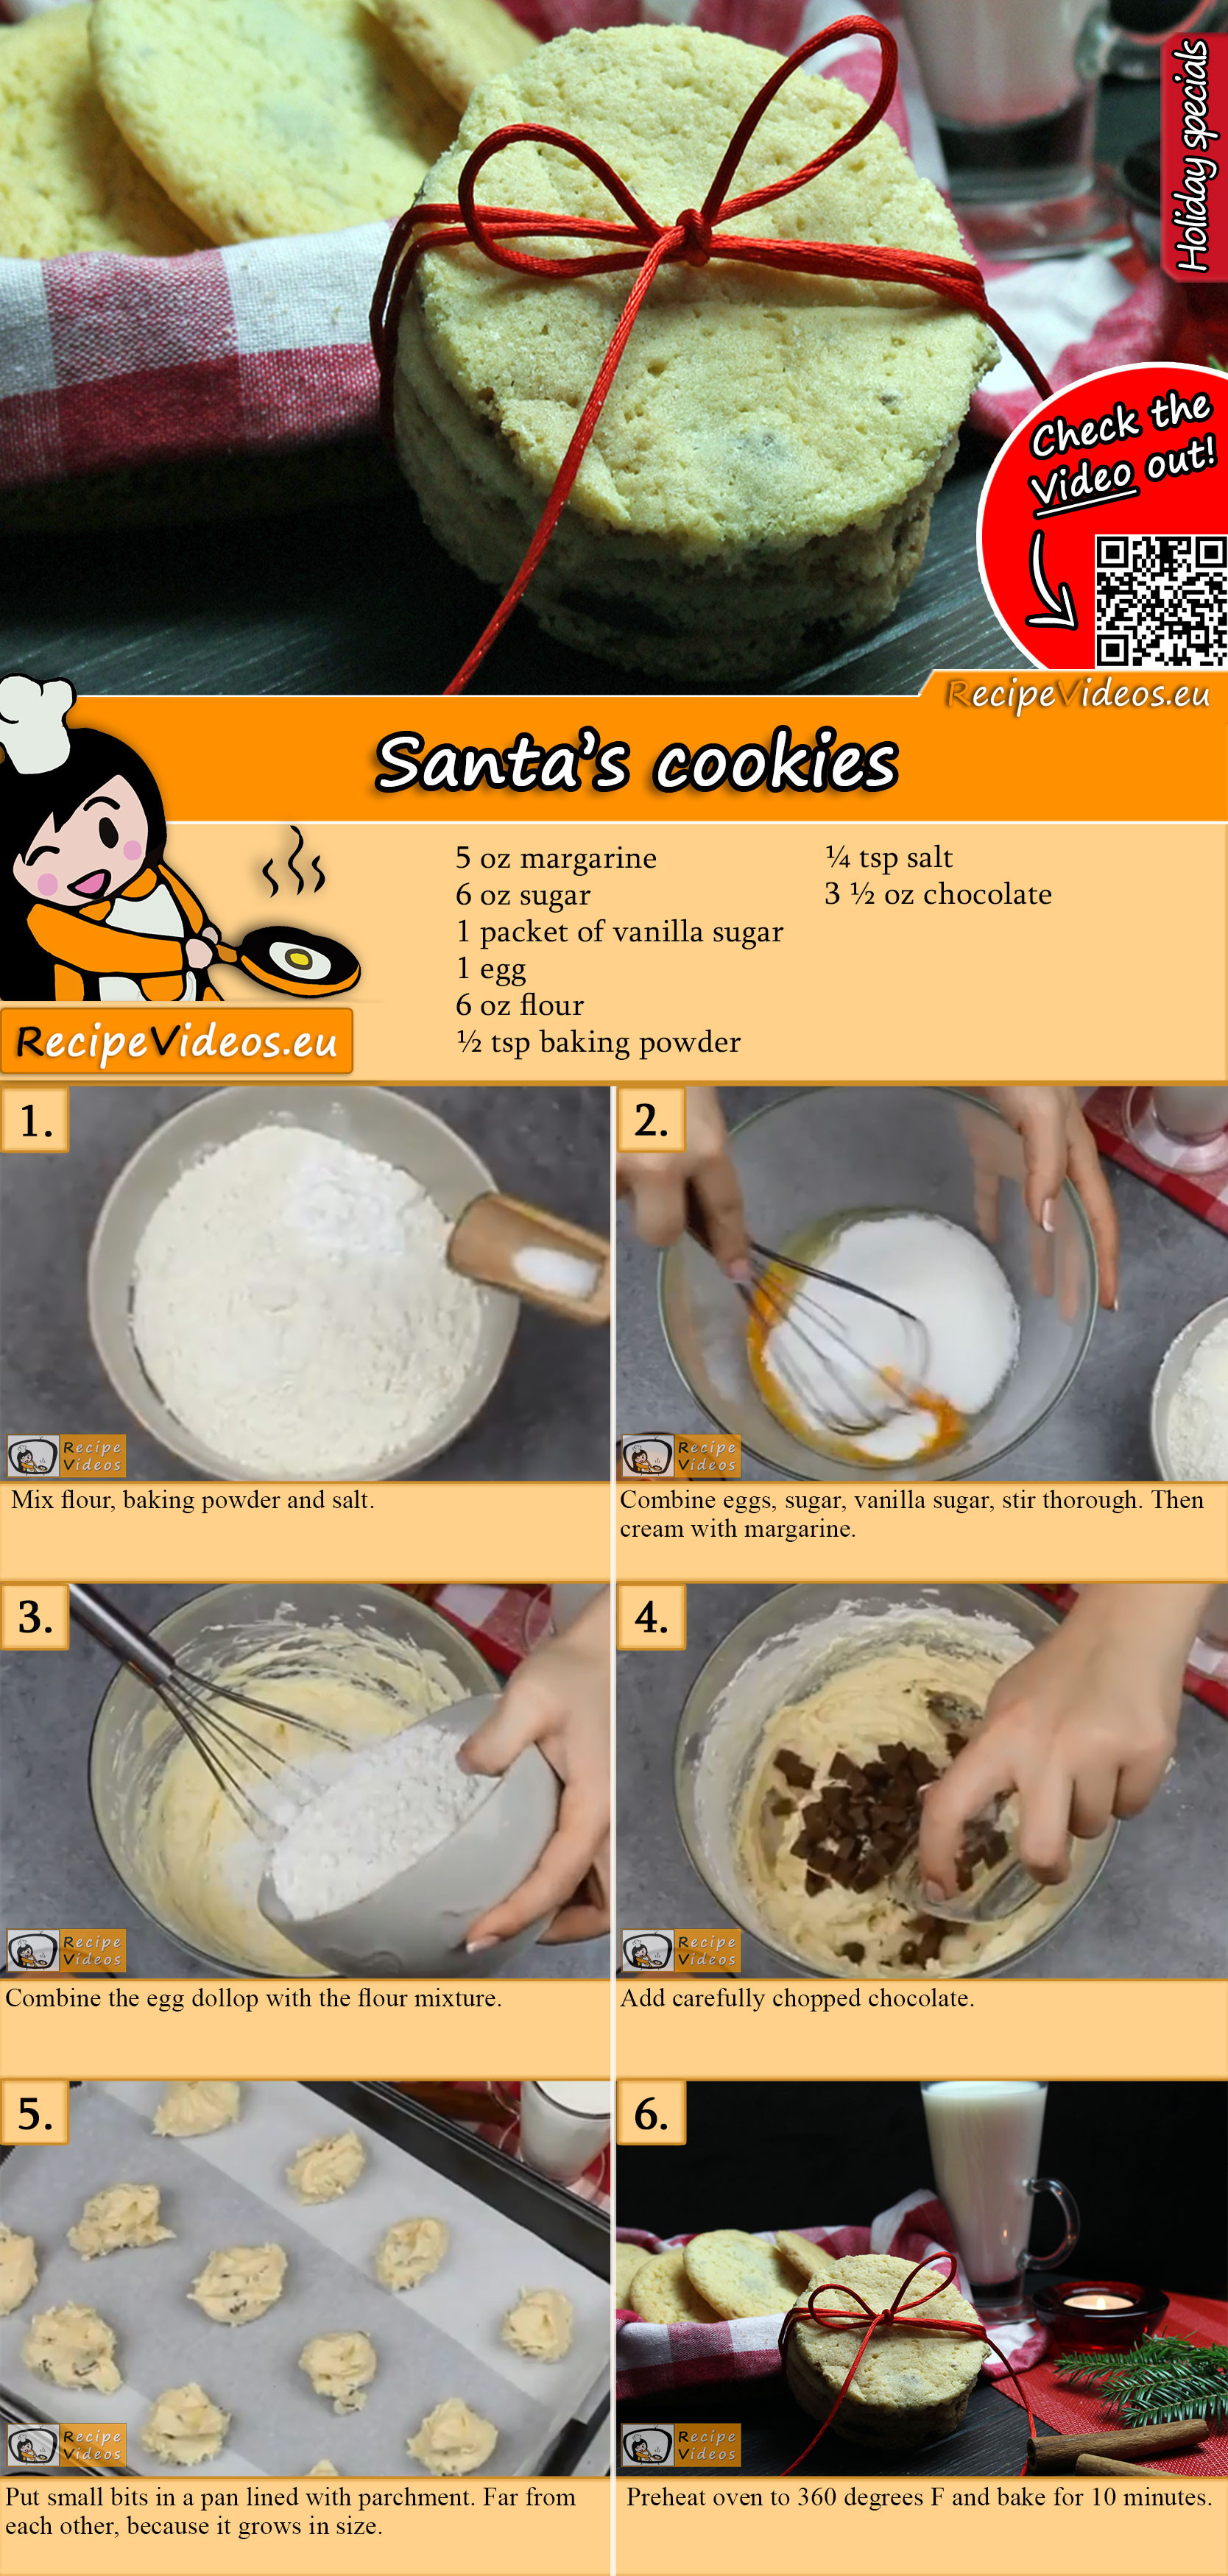 Santa's cookies recipe with video